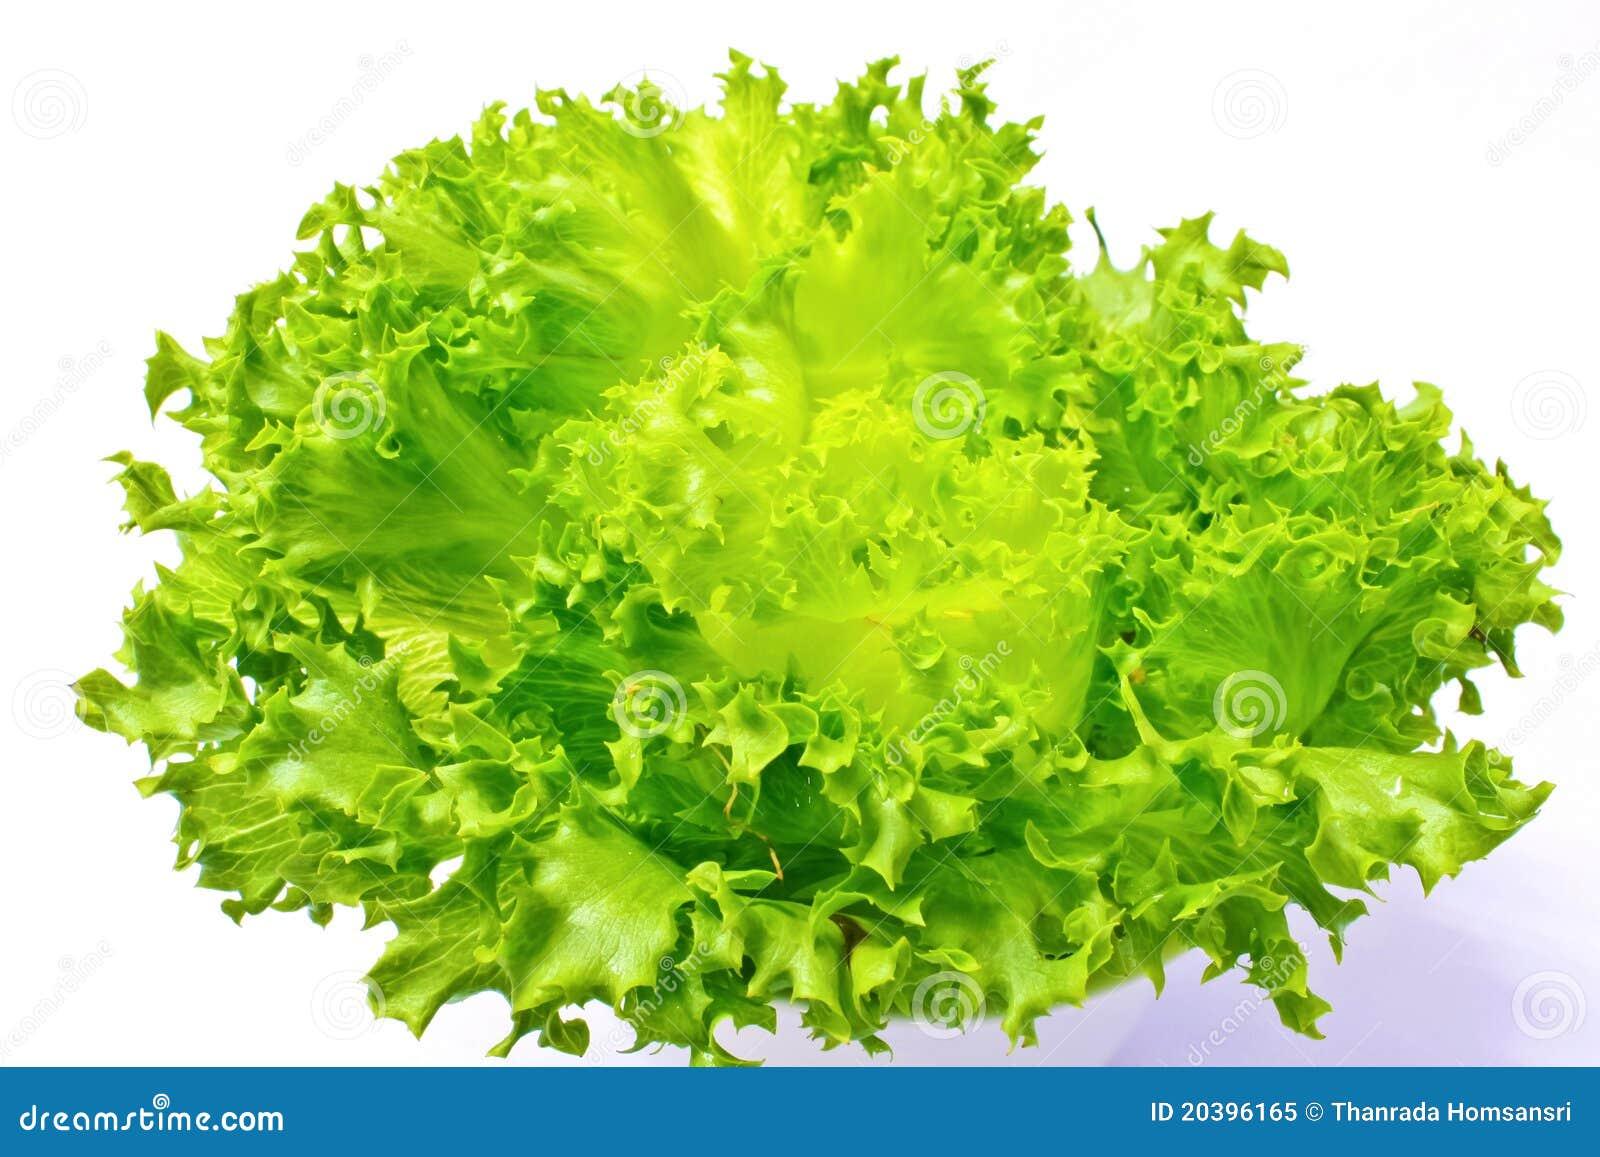 how to clean iceberg lettuce